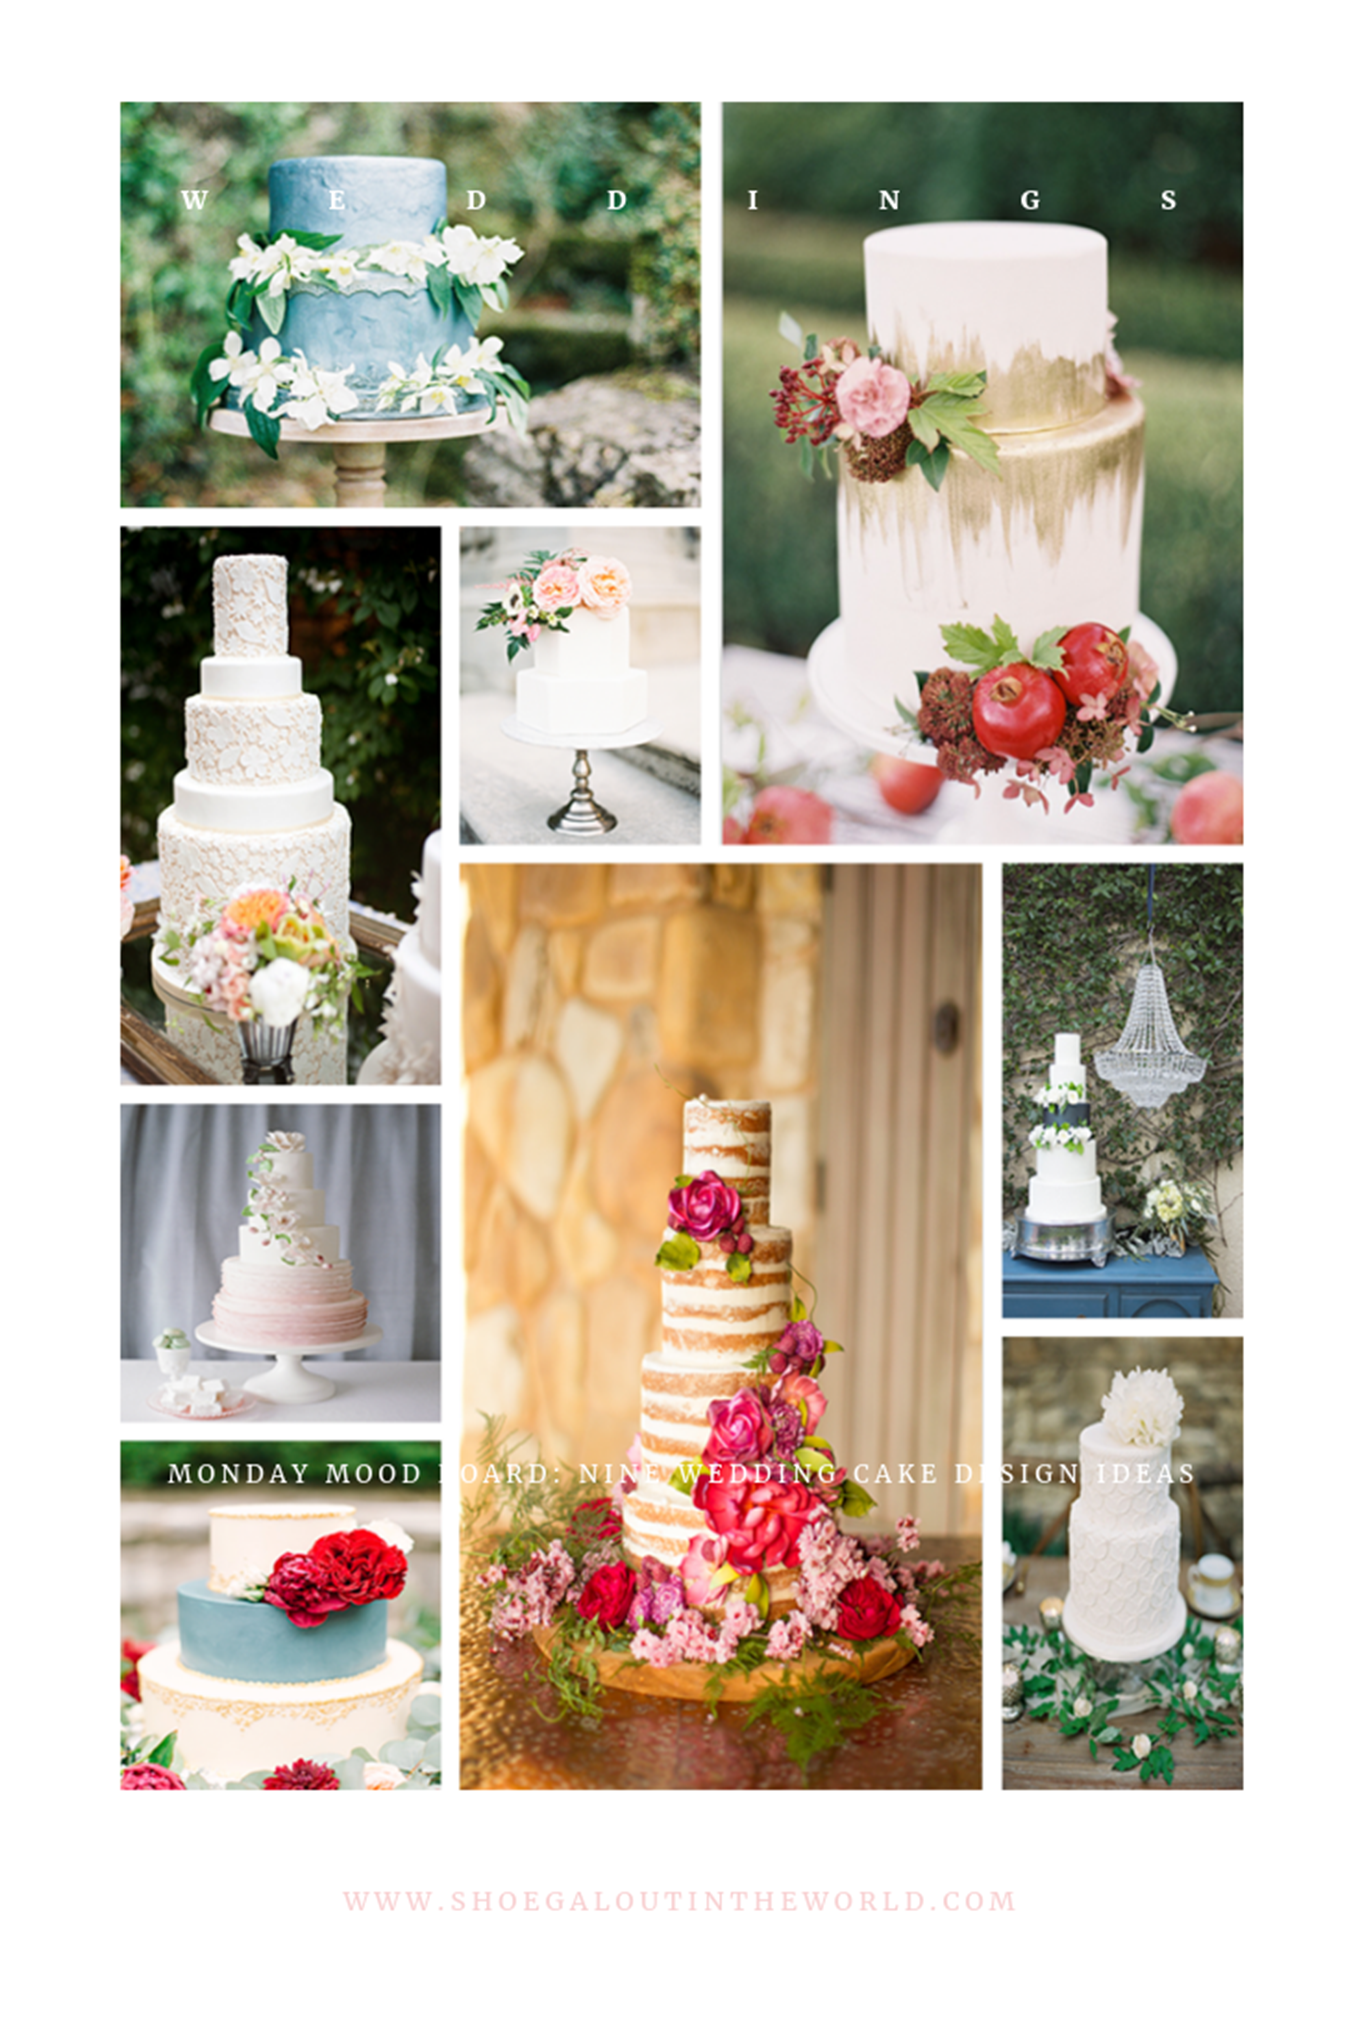 Nine Wedding Cake Design Ideas Shoegal Out In The World,Minimalist Negative Space Logo Design